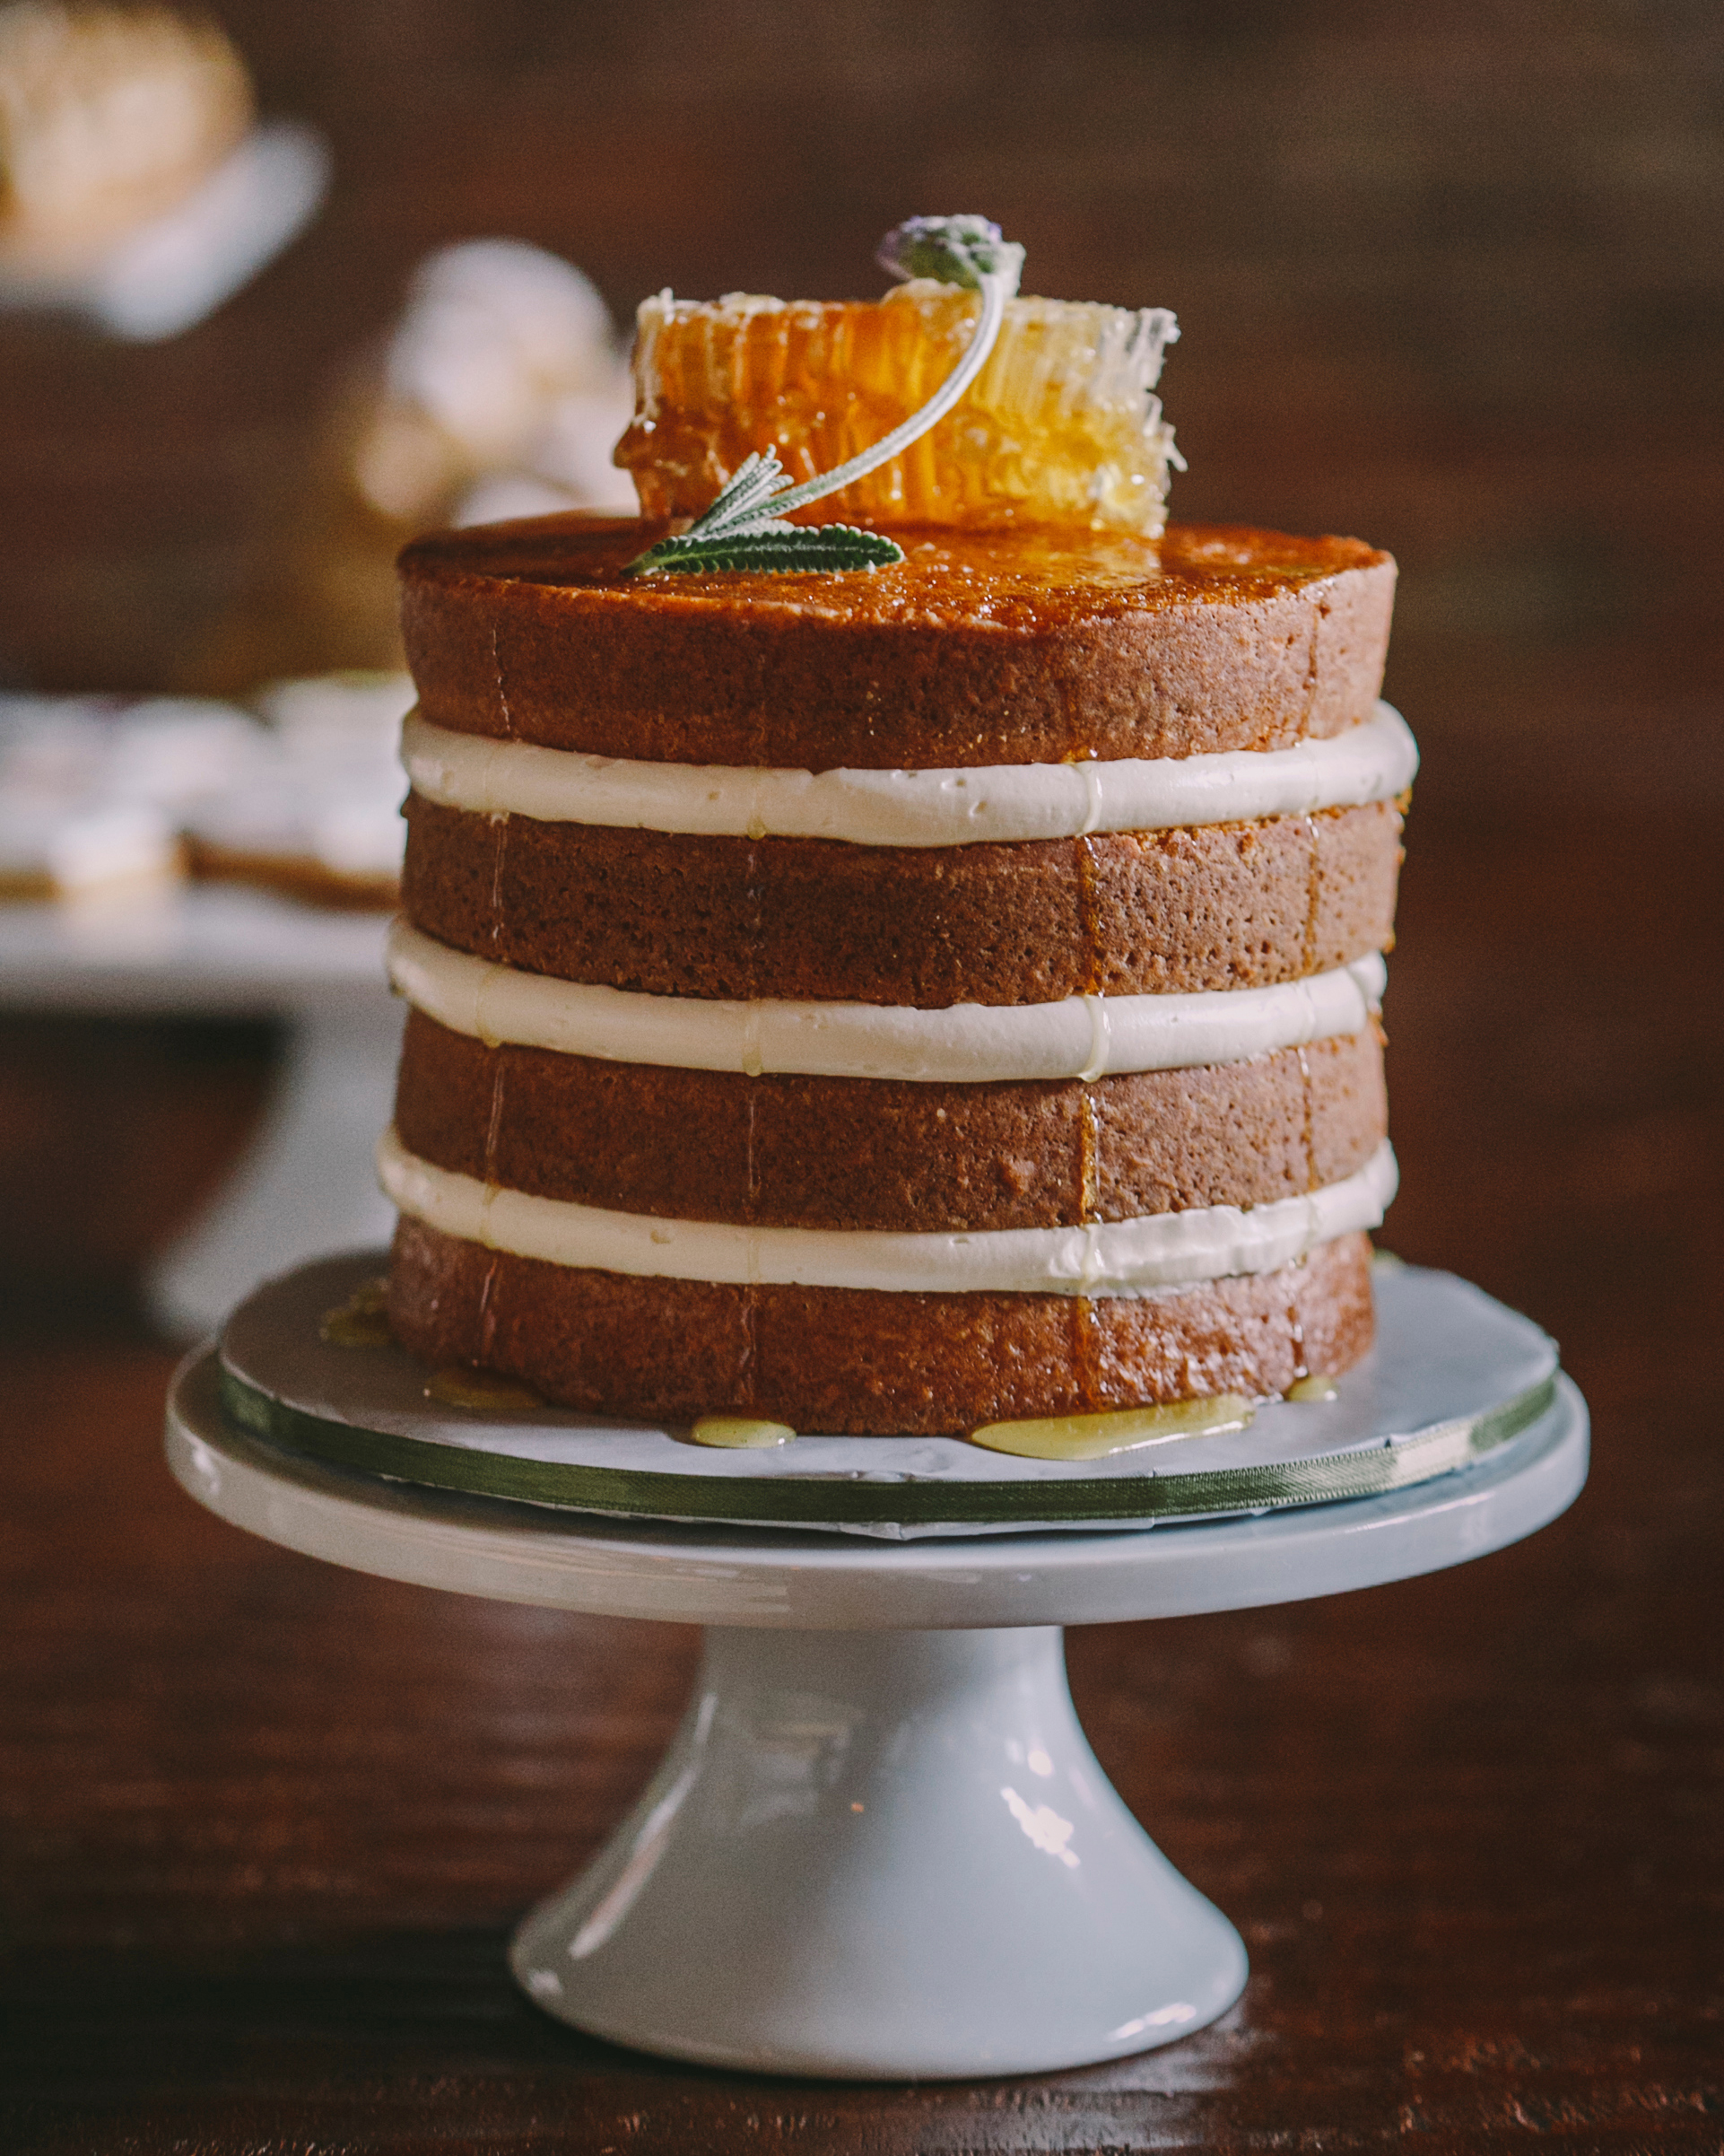 creative-cake-flavors-honey-lavender-white-wine-soaked-vanilla-0116.jpg